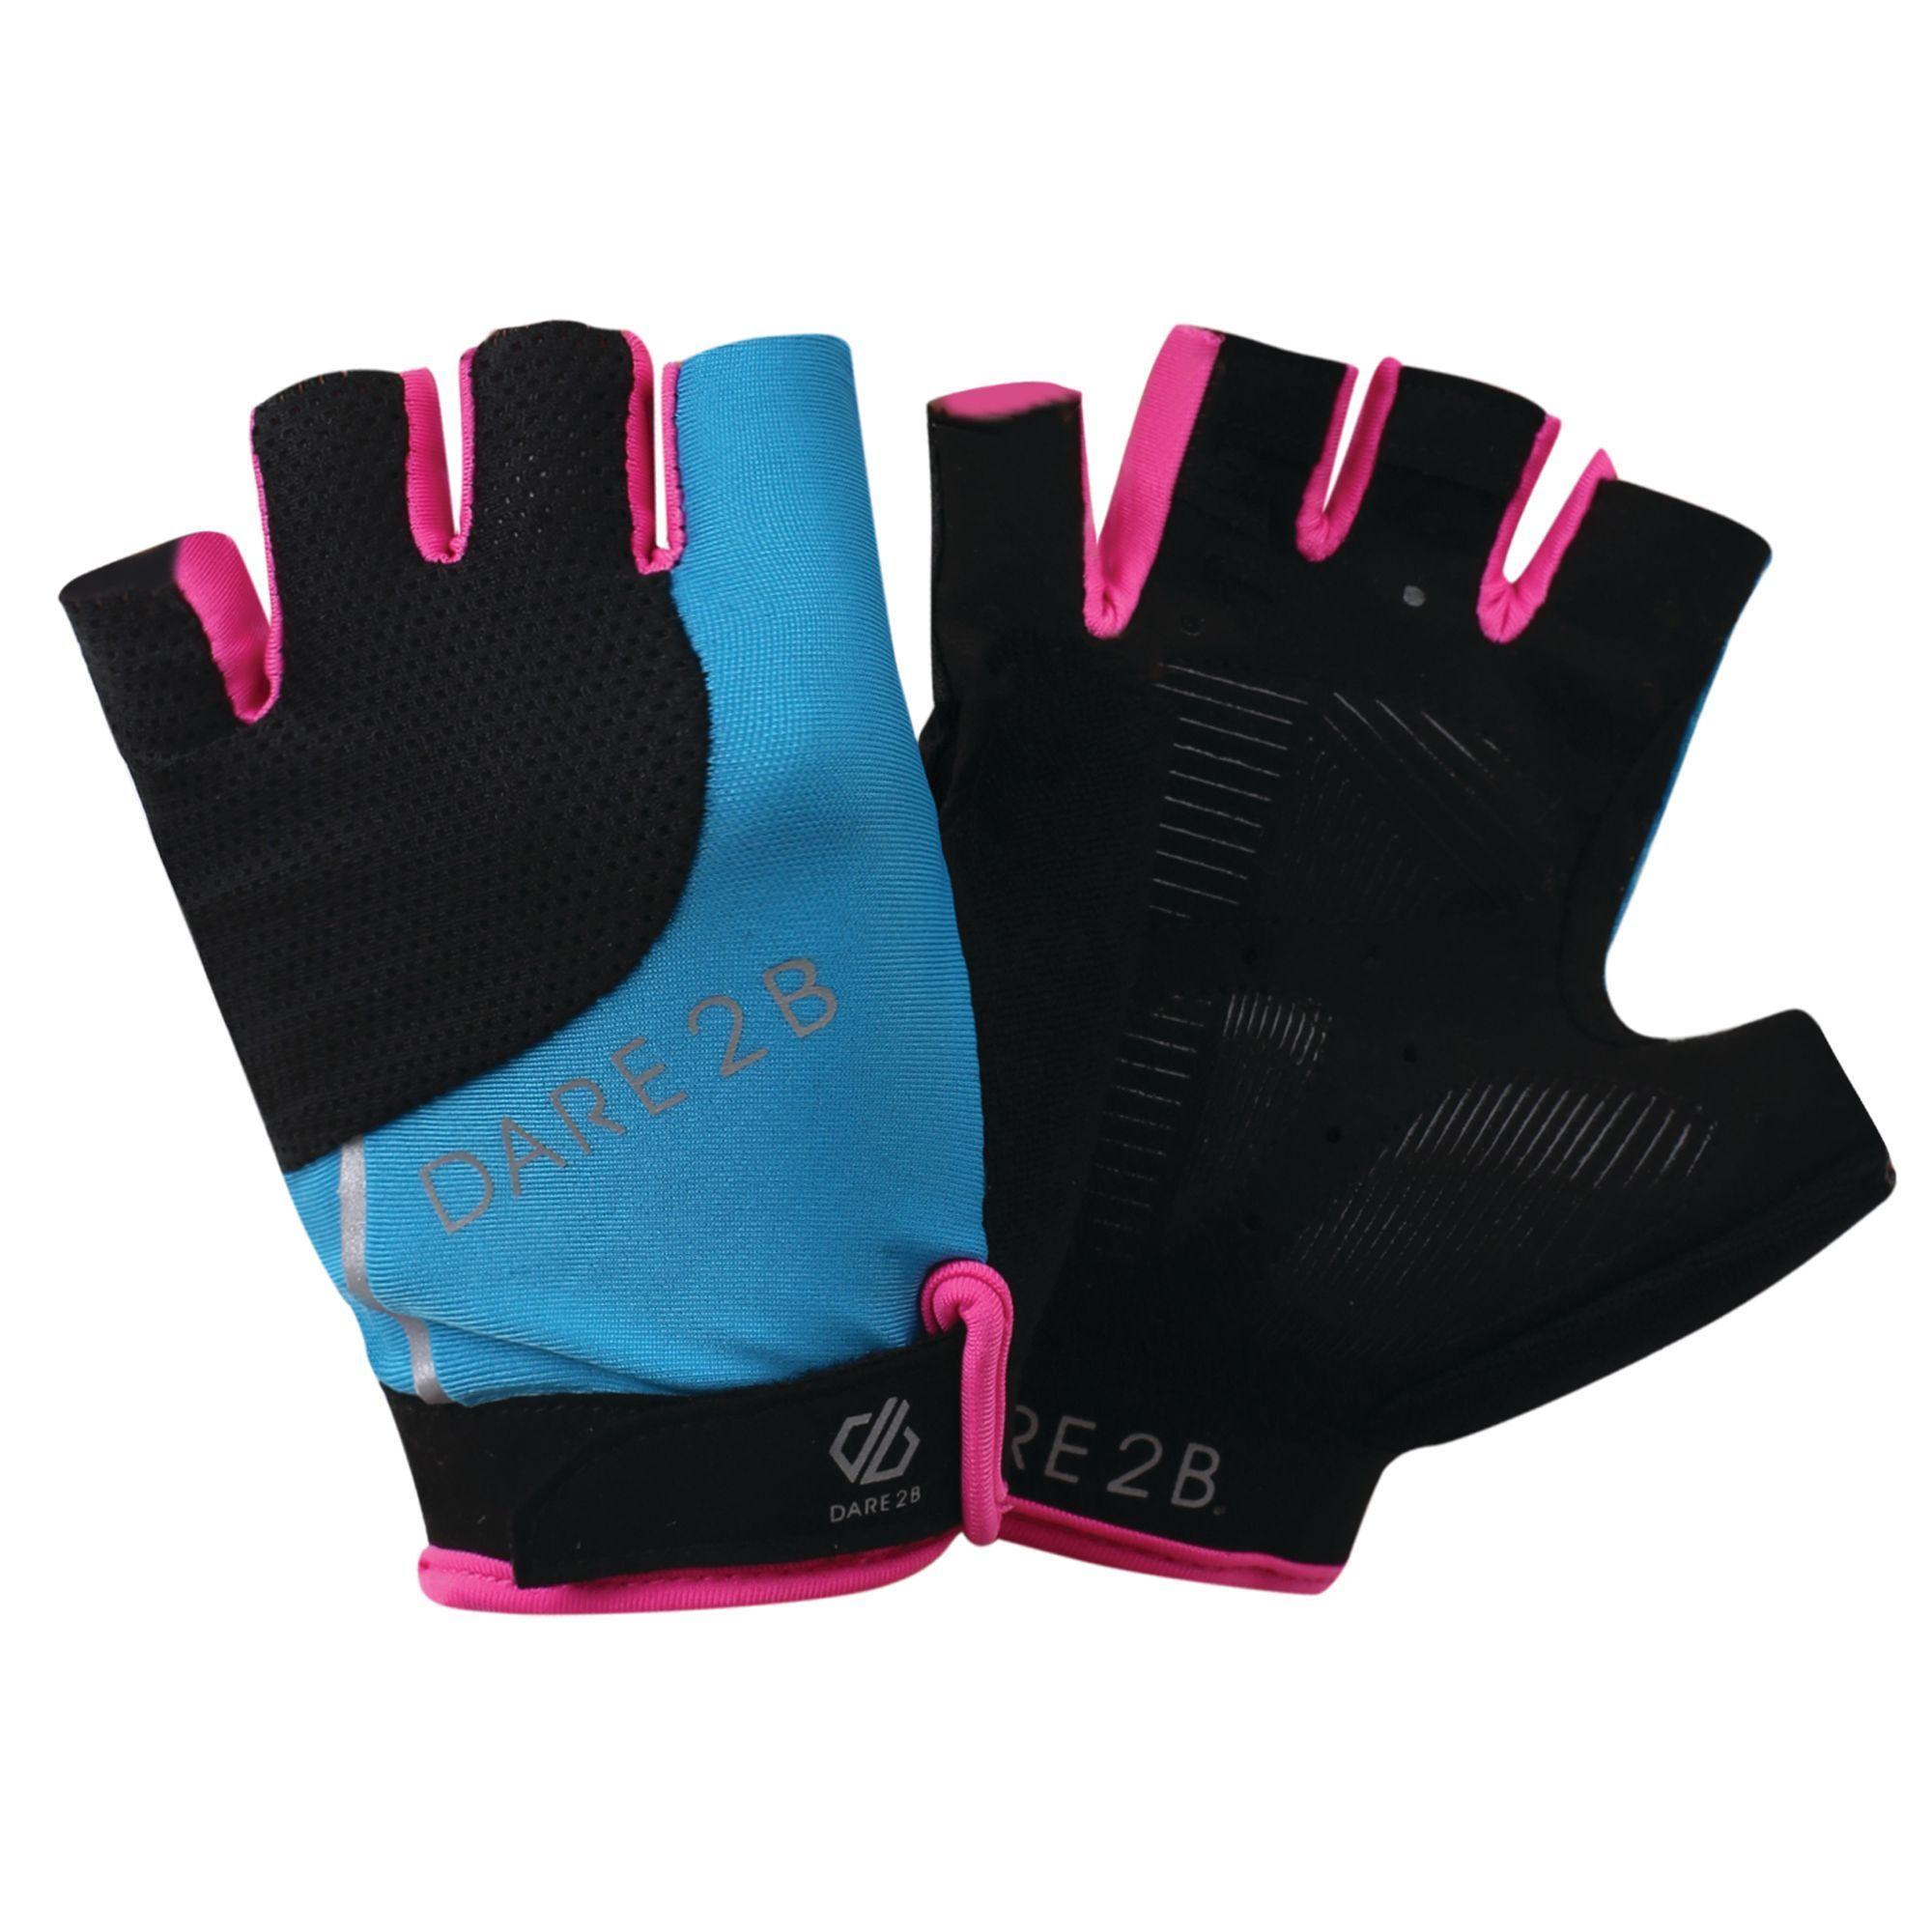 Dare 2B Womens/Ladies Forcible Fingerless Gloves